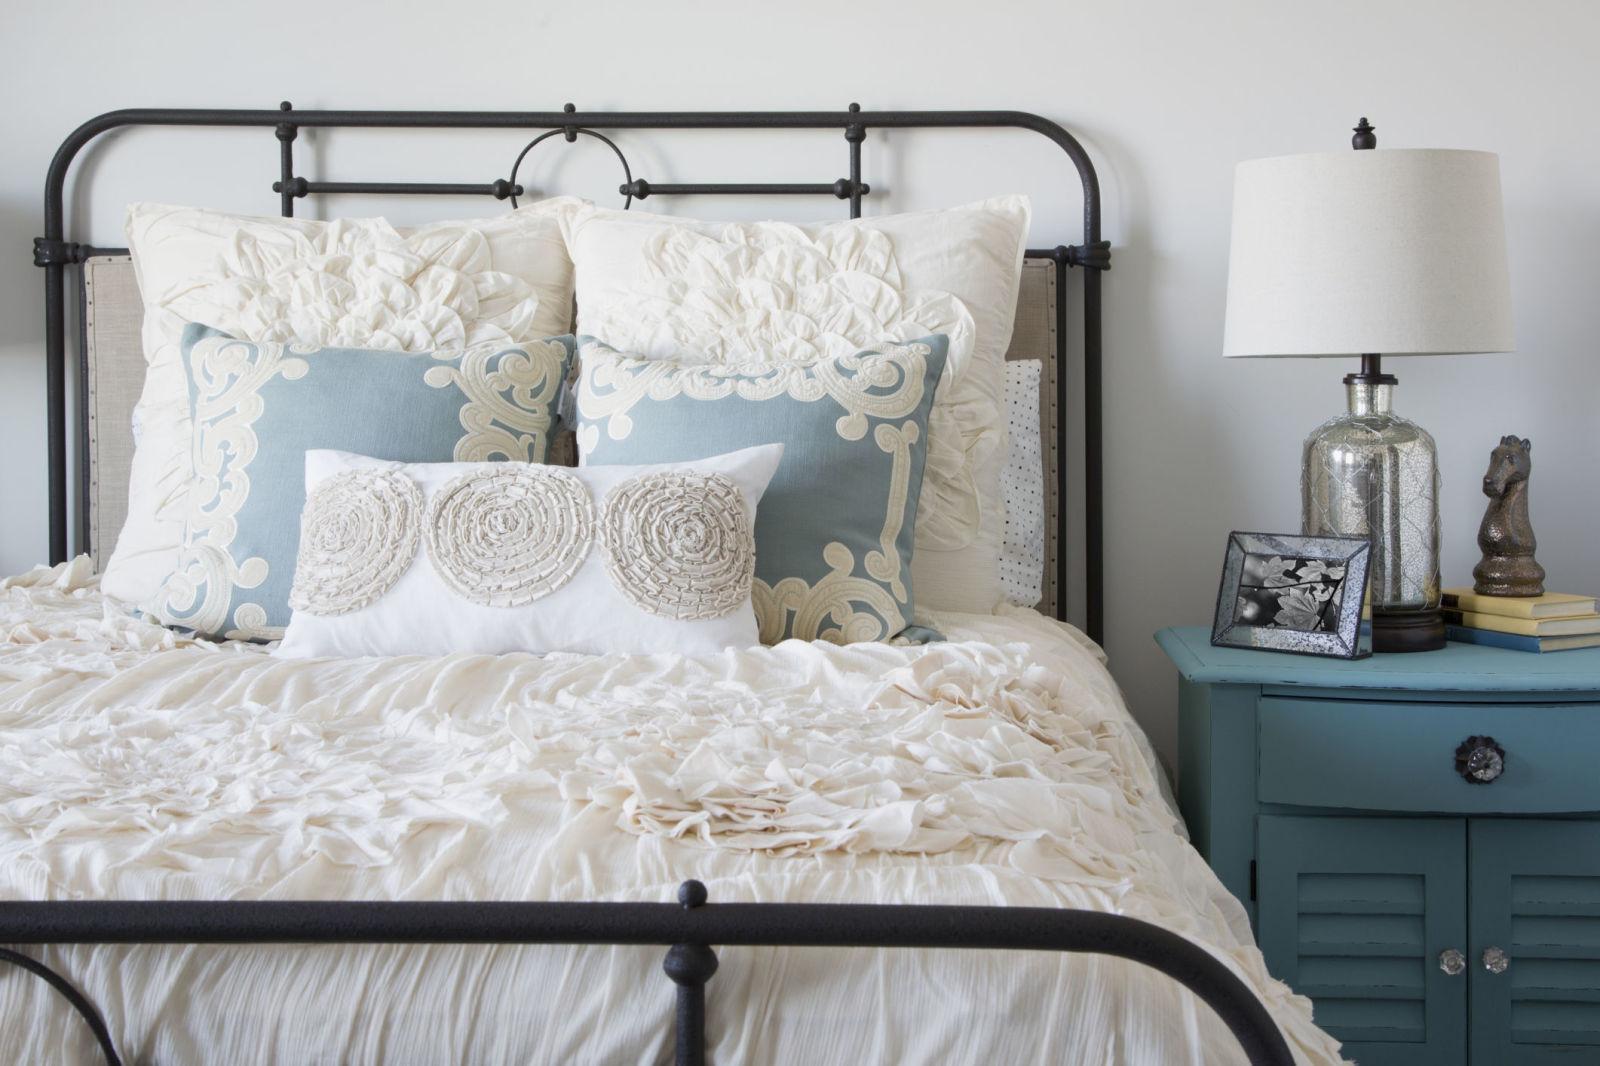 guest bedroom ideas guest bedroom decorating ideas - tips for decorating a guest bedroom GIMNXXL